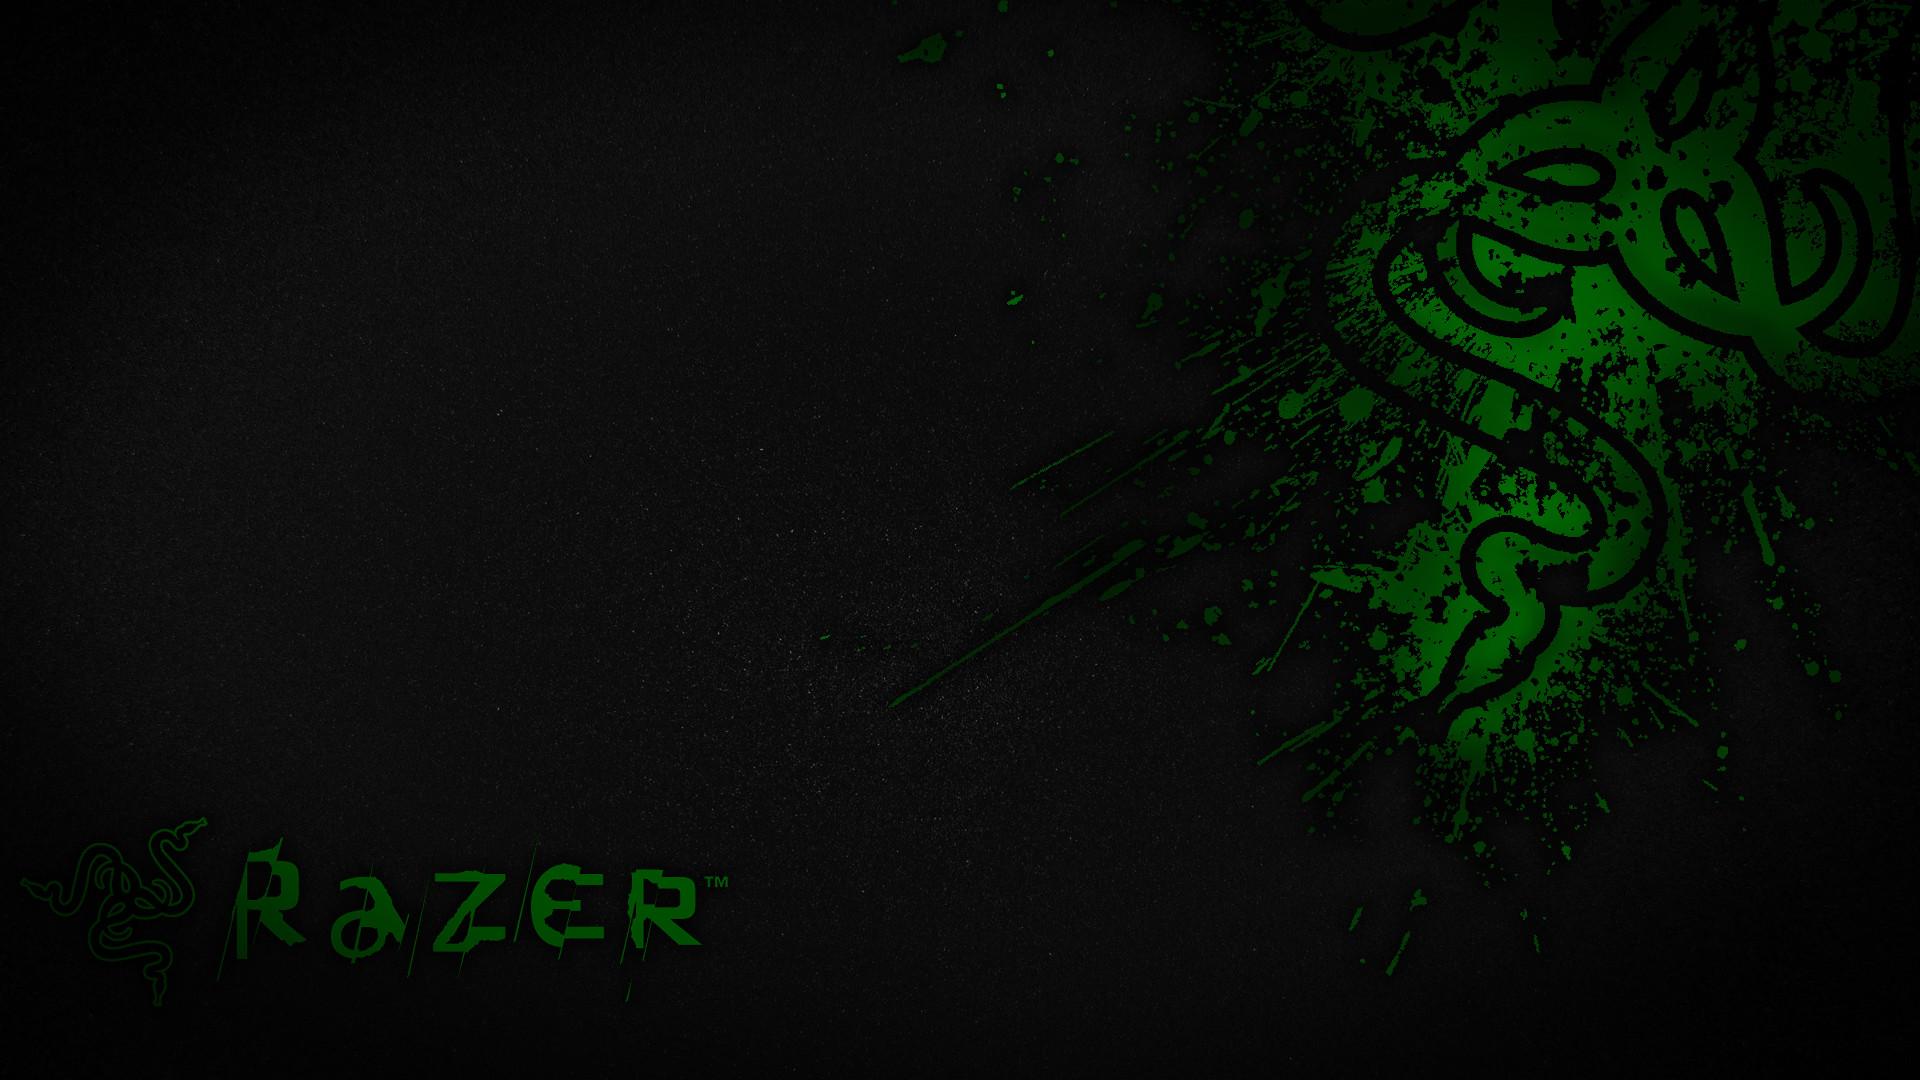 Razer Wallpapers Hd Green